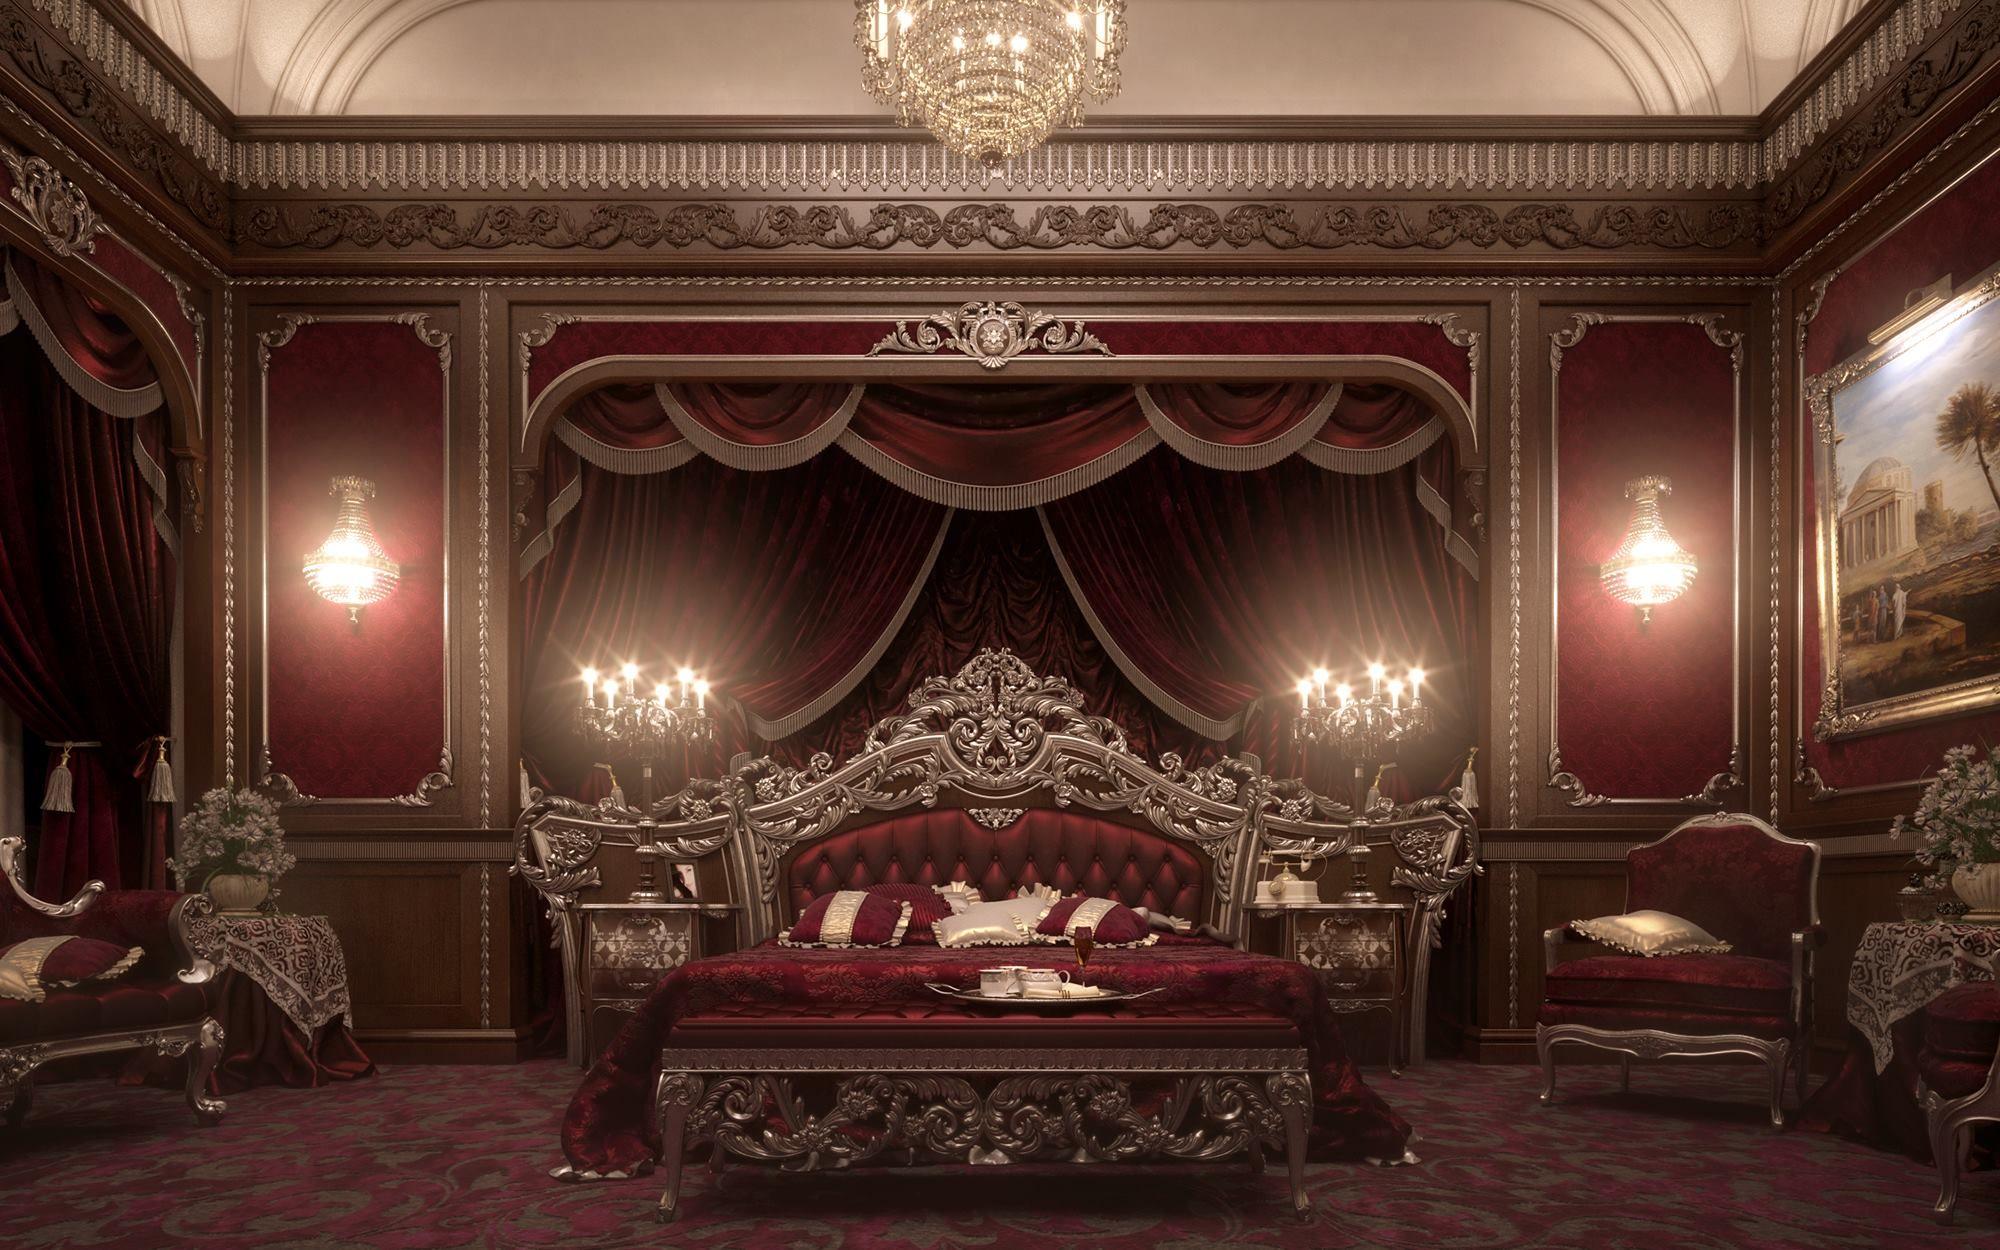 Ambiance Theatrale A L Italienne D Inspiration Victorienne Chambre Victorienne Design De Chambre De Luxe Deco Chambre Romantique Red luxury room pictures